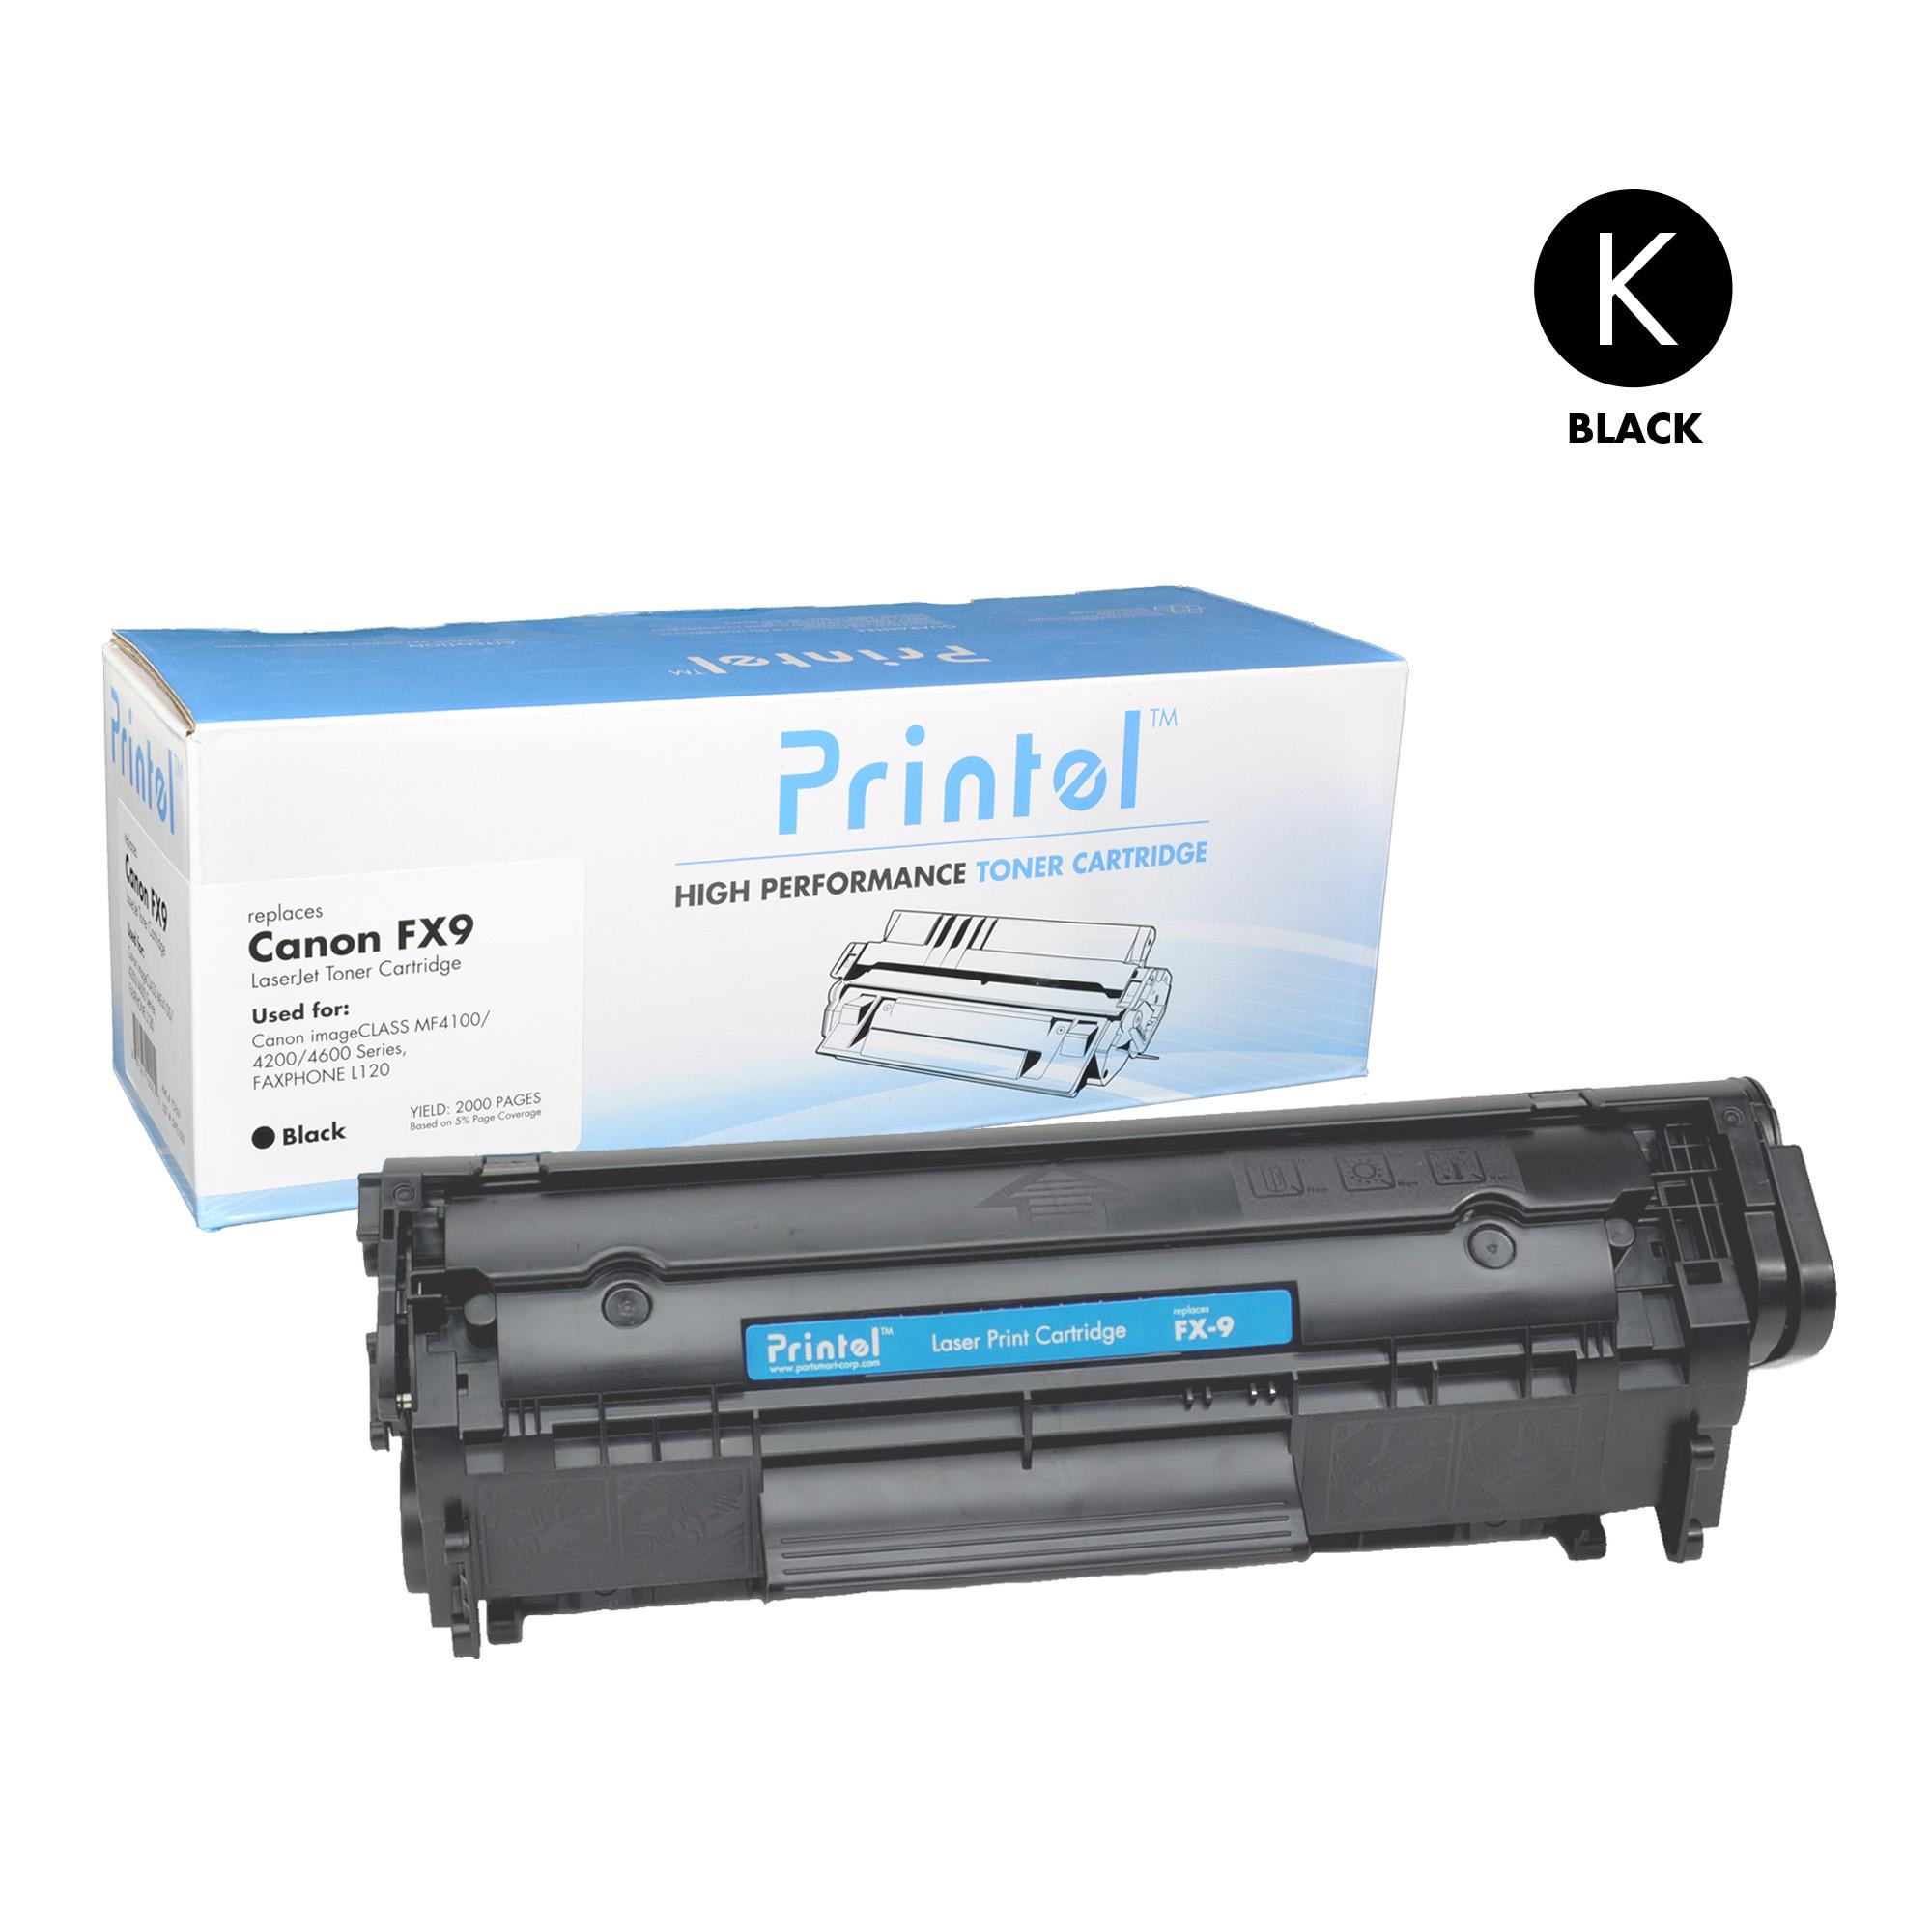 Canon Imageclass Mf4150 Printer Inkjet Cartridges And Toner